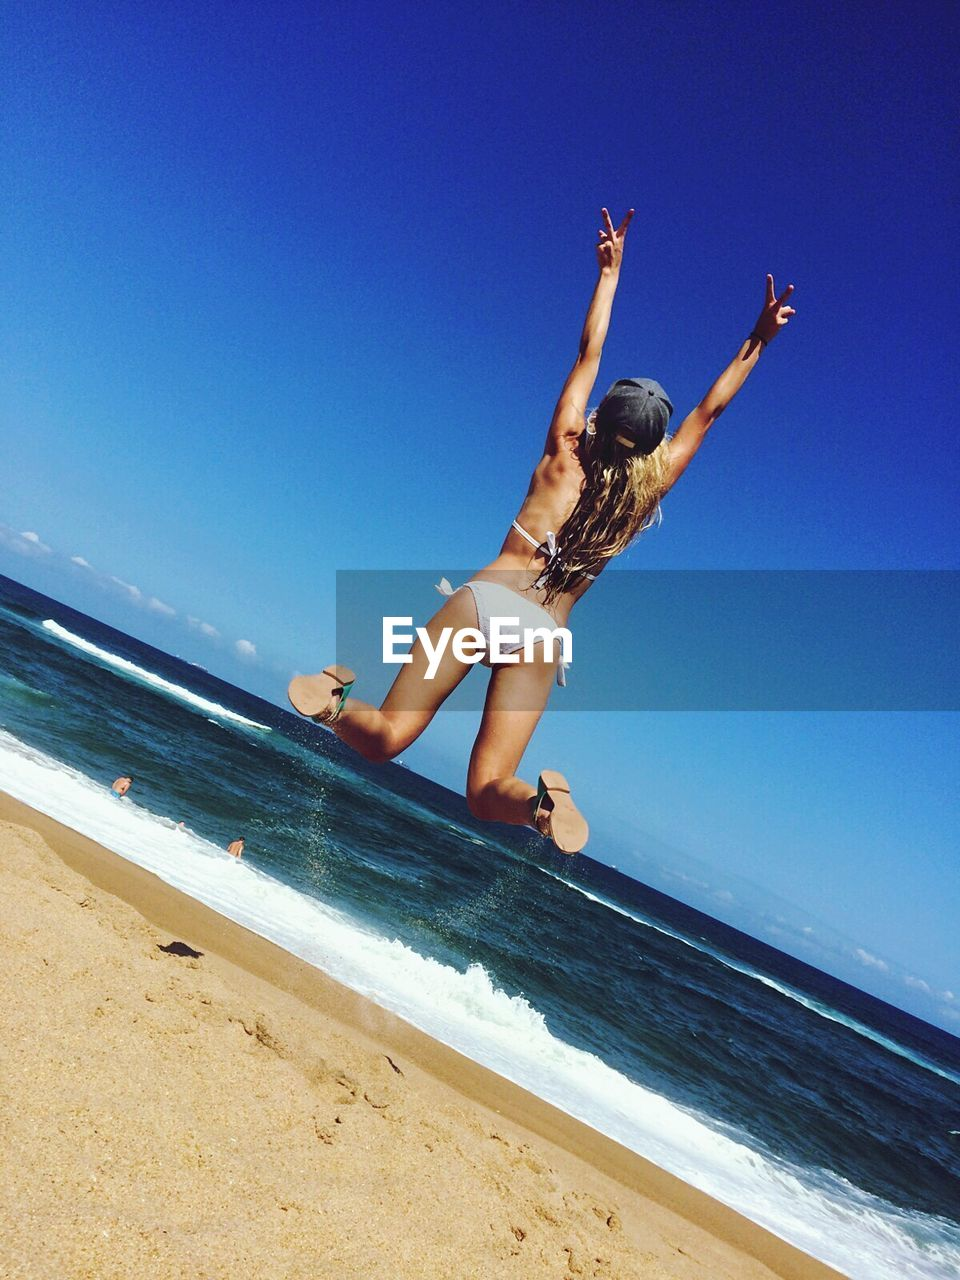 Rear View Of Young Woman Wearing Bikini Jumping At Beach